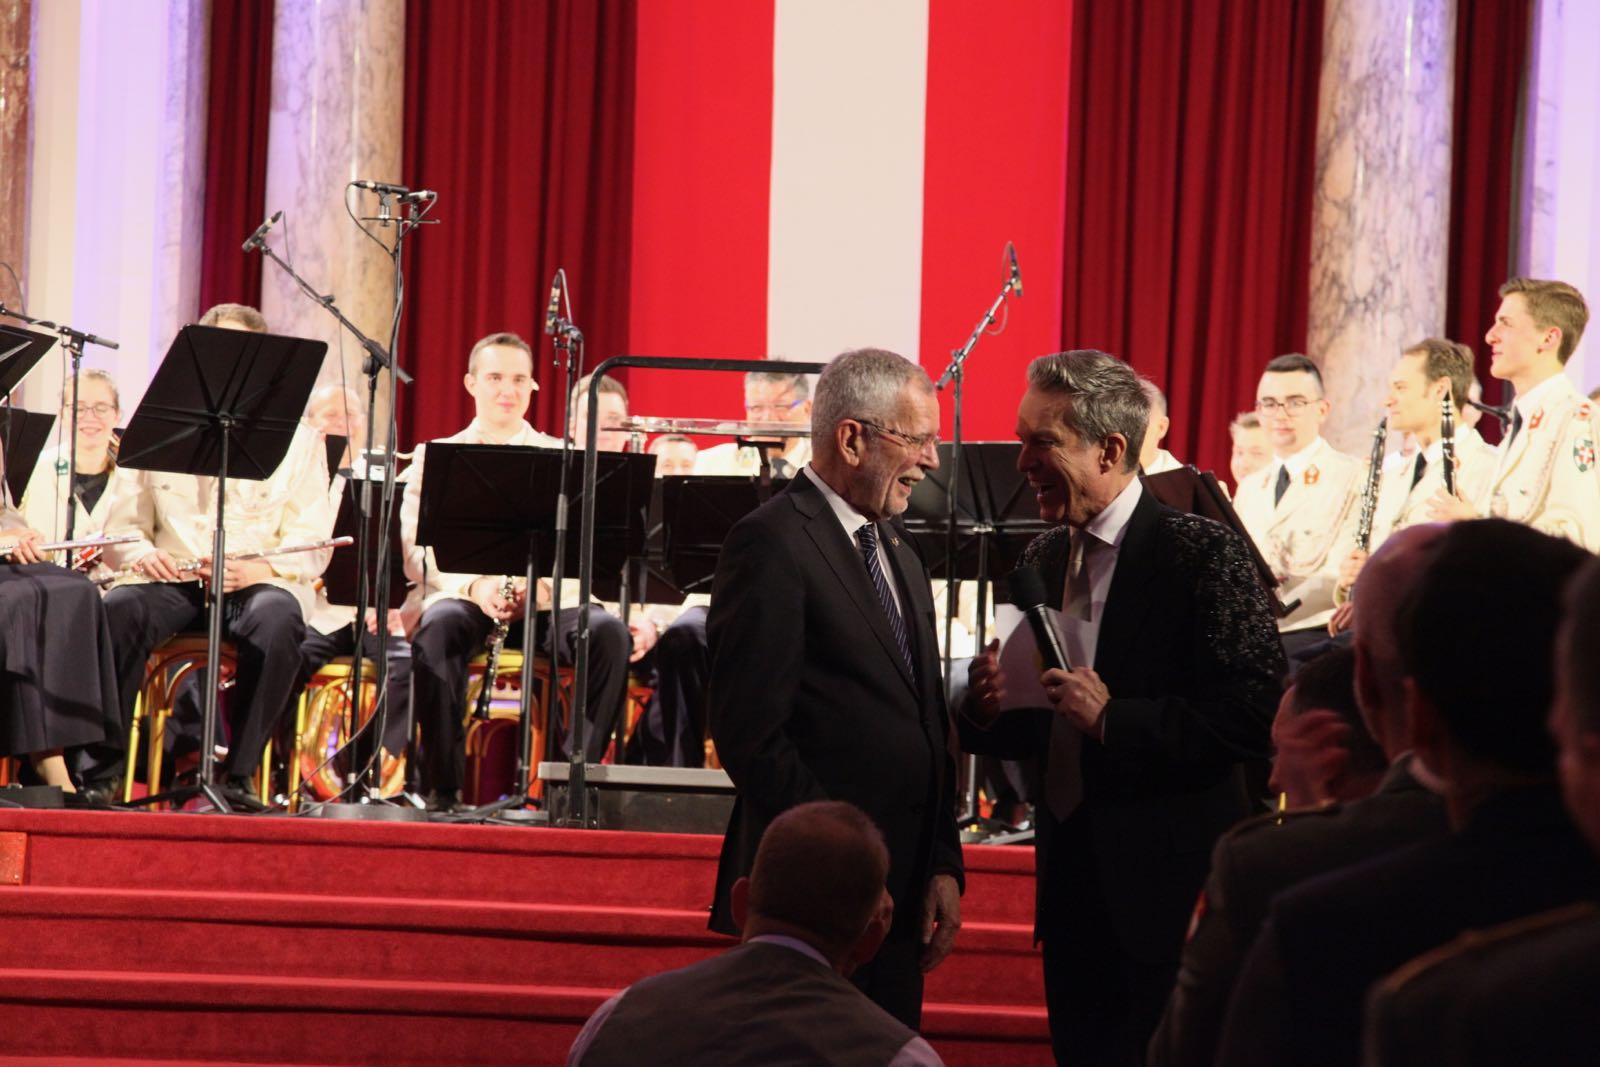 2019_03_14Gardemusik_Frühjahrskonzert_HBP_Hofburg - 93 of 177